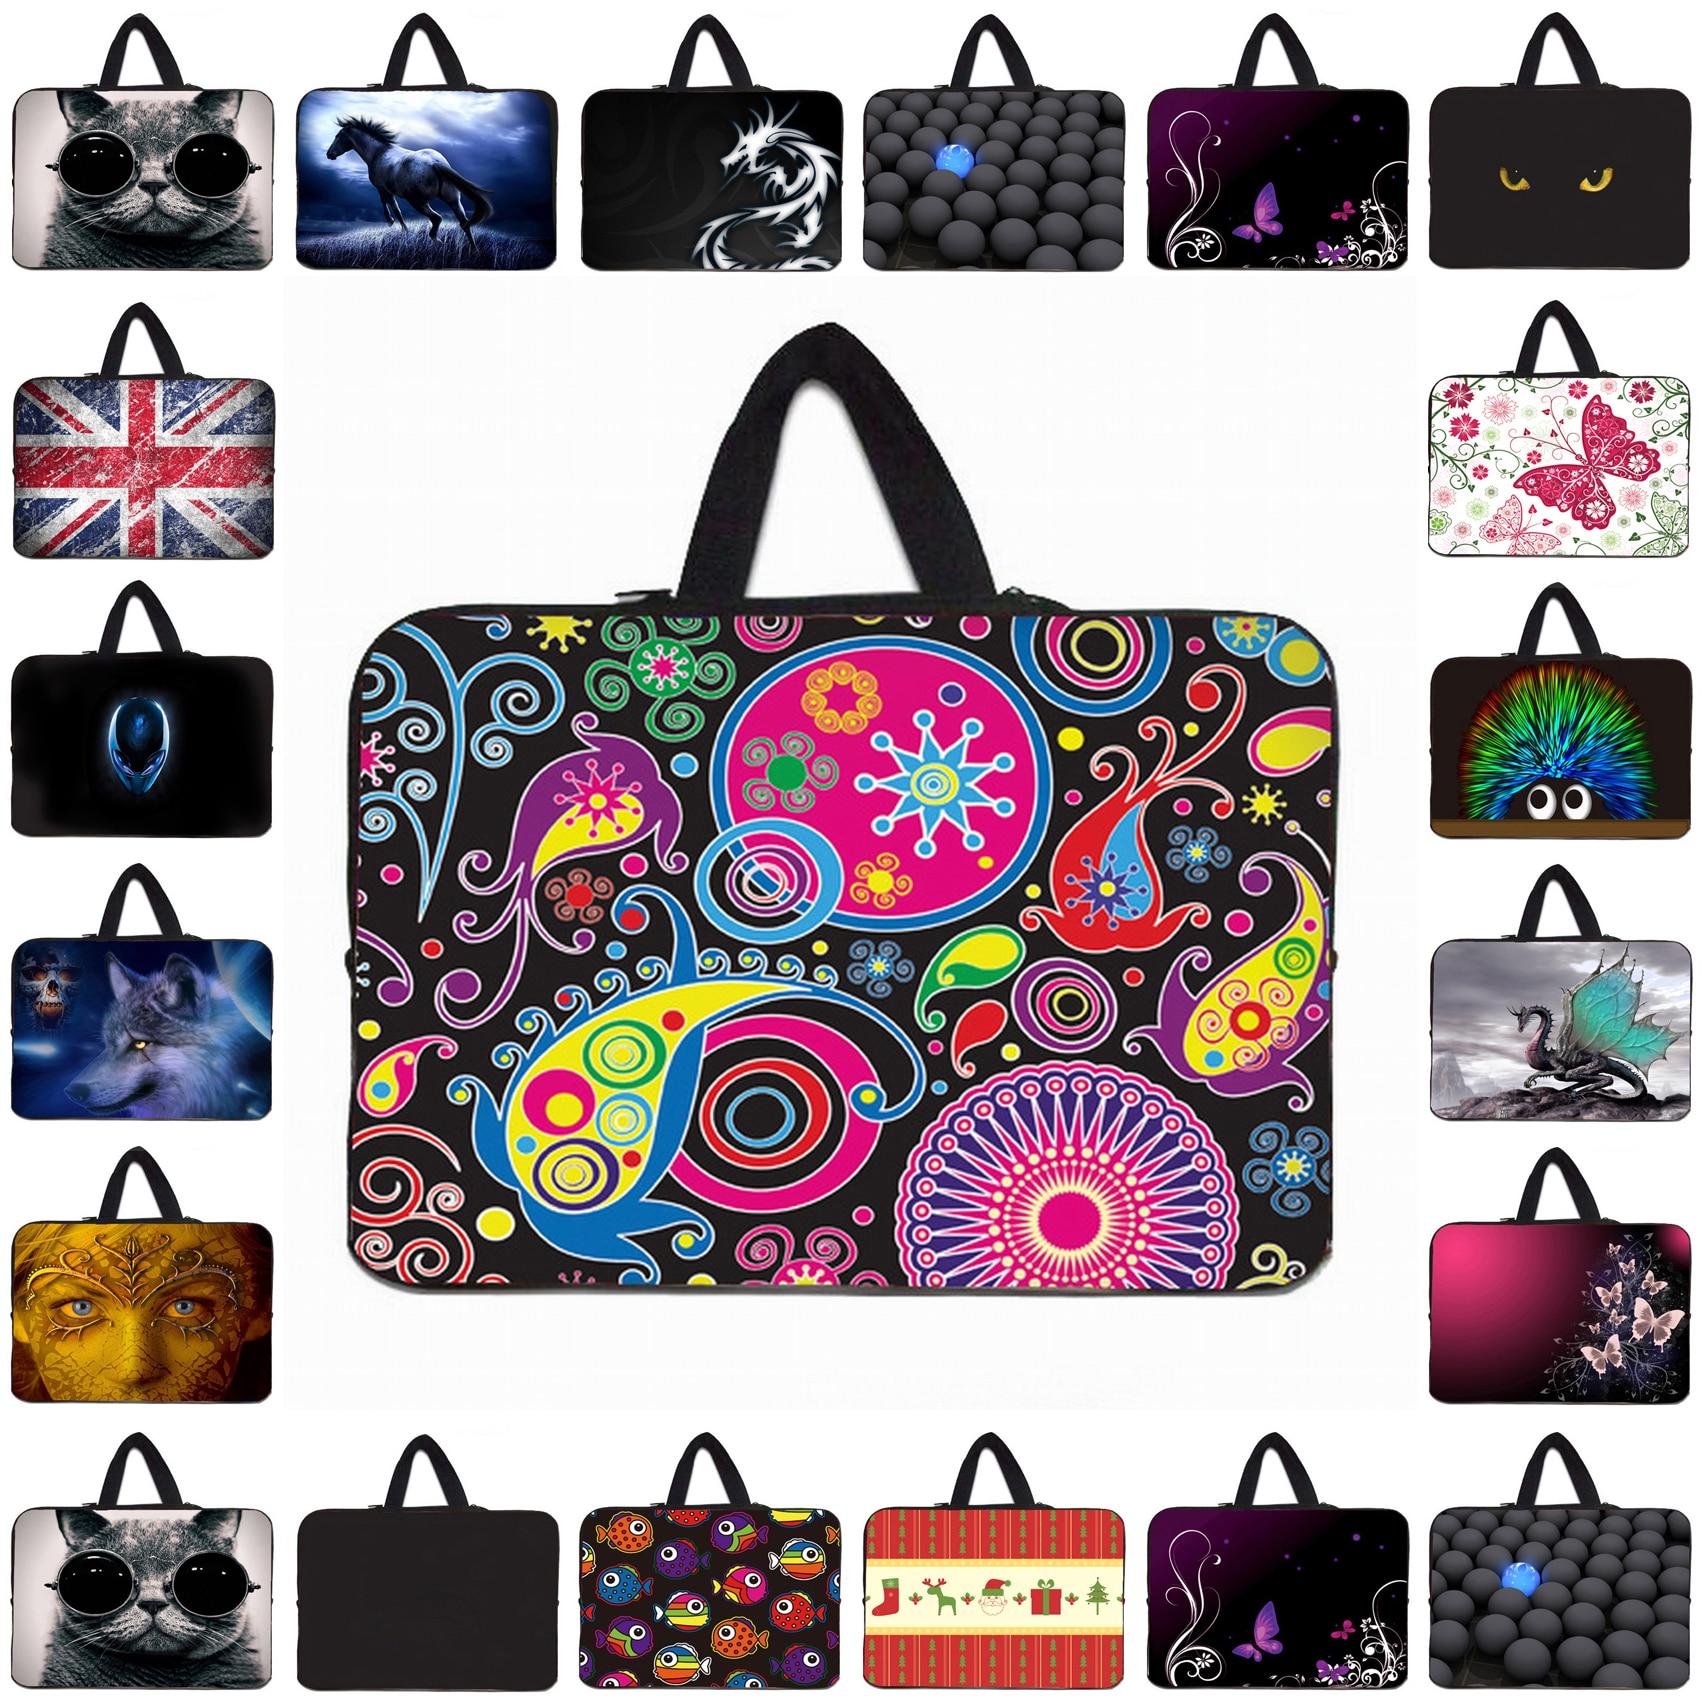 "Netbook Tablet Neoprene Inner Pouch Bags For Acer Aspire Switch 10 Mini Laptop Cases 9.7"" 10.1"" 10.2"" Notebook Fashion Handbag"